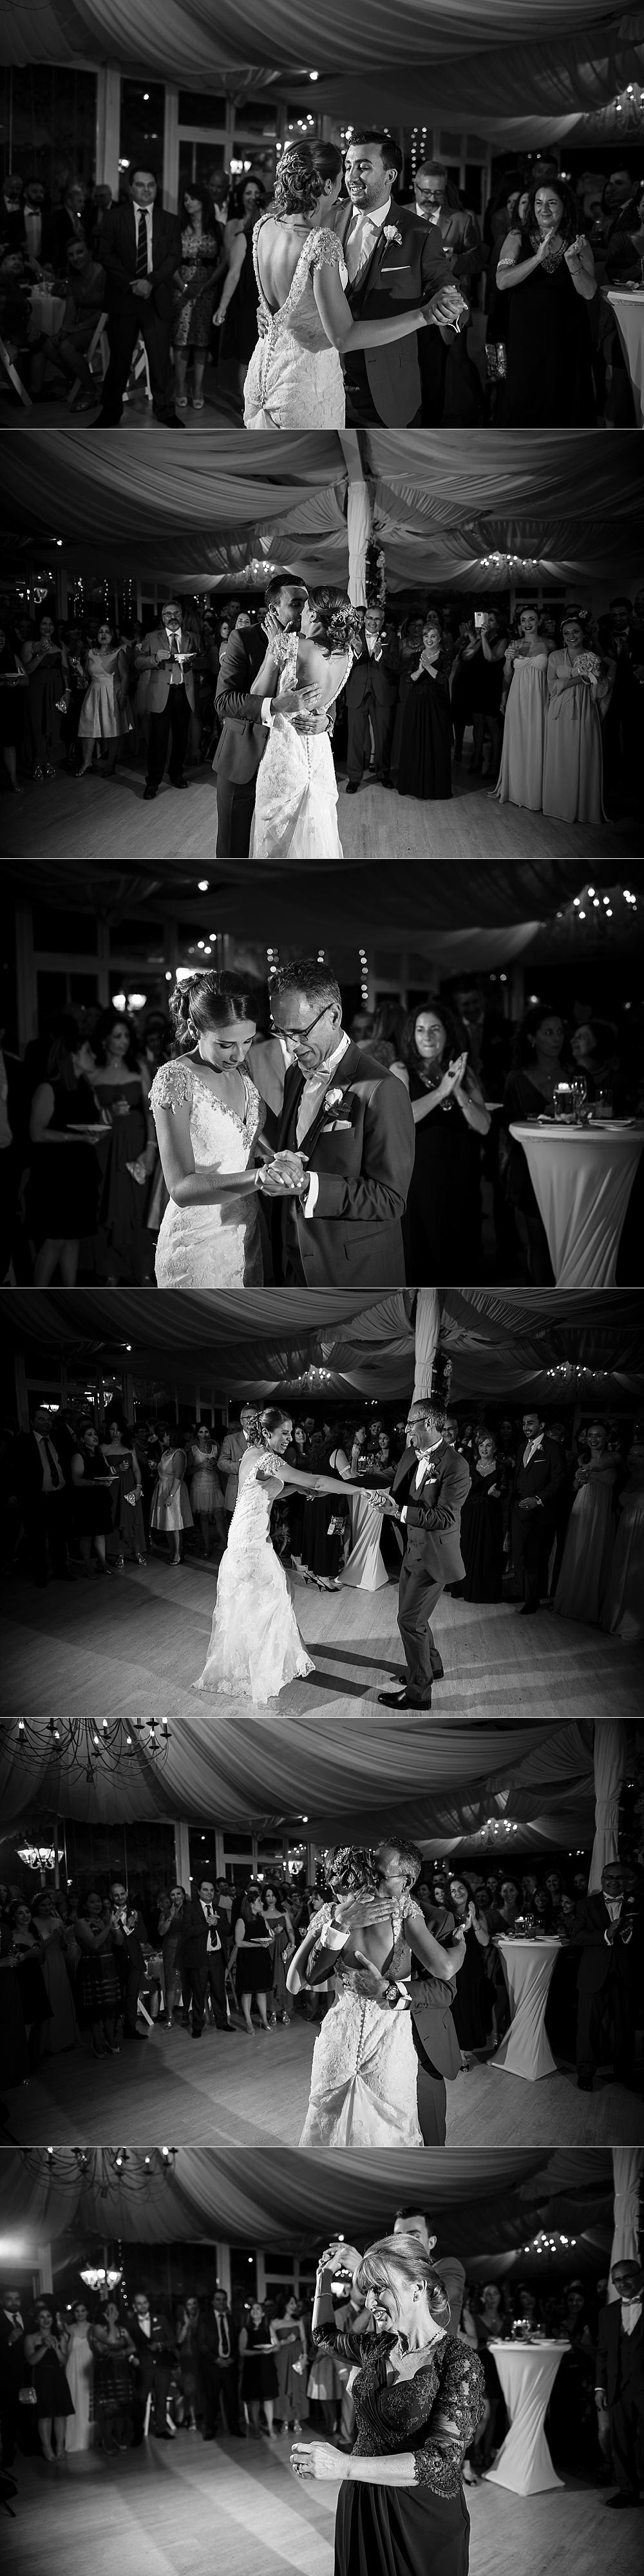 Gail & Shawn - Wedding Photography Malta - Villa Arrigo - Shane P. Watts Photography